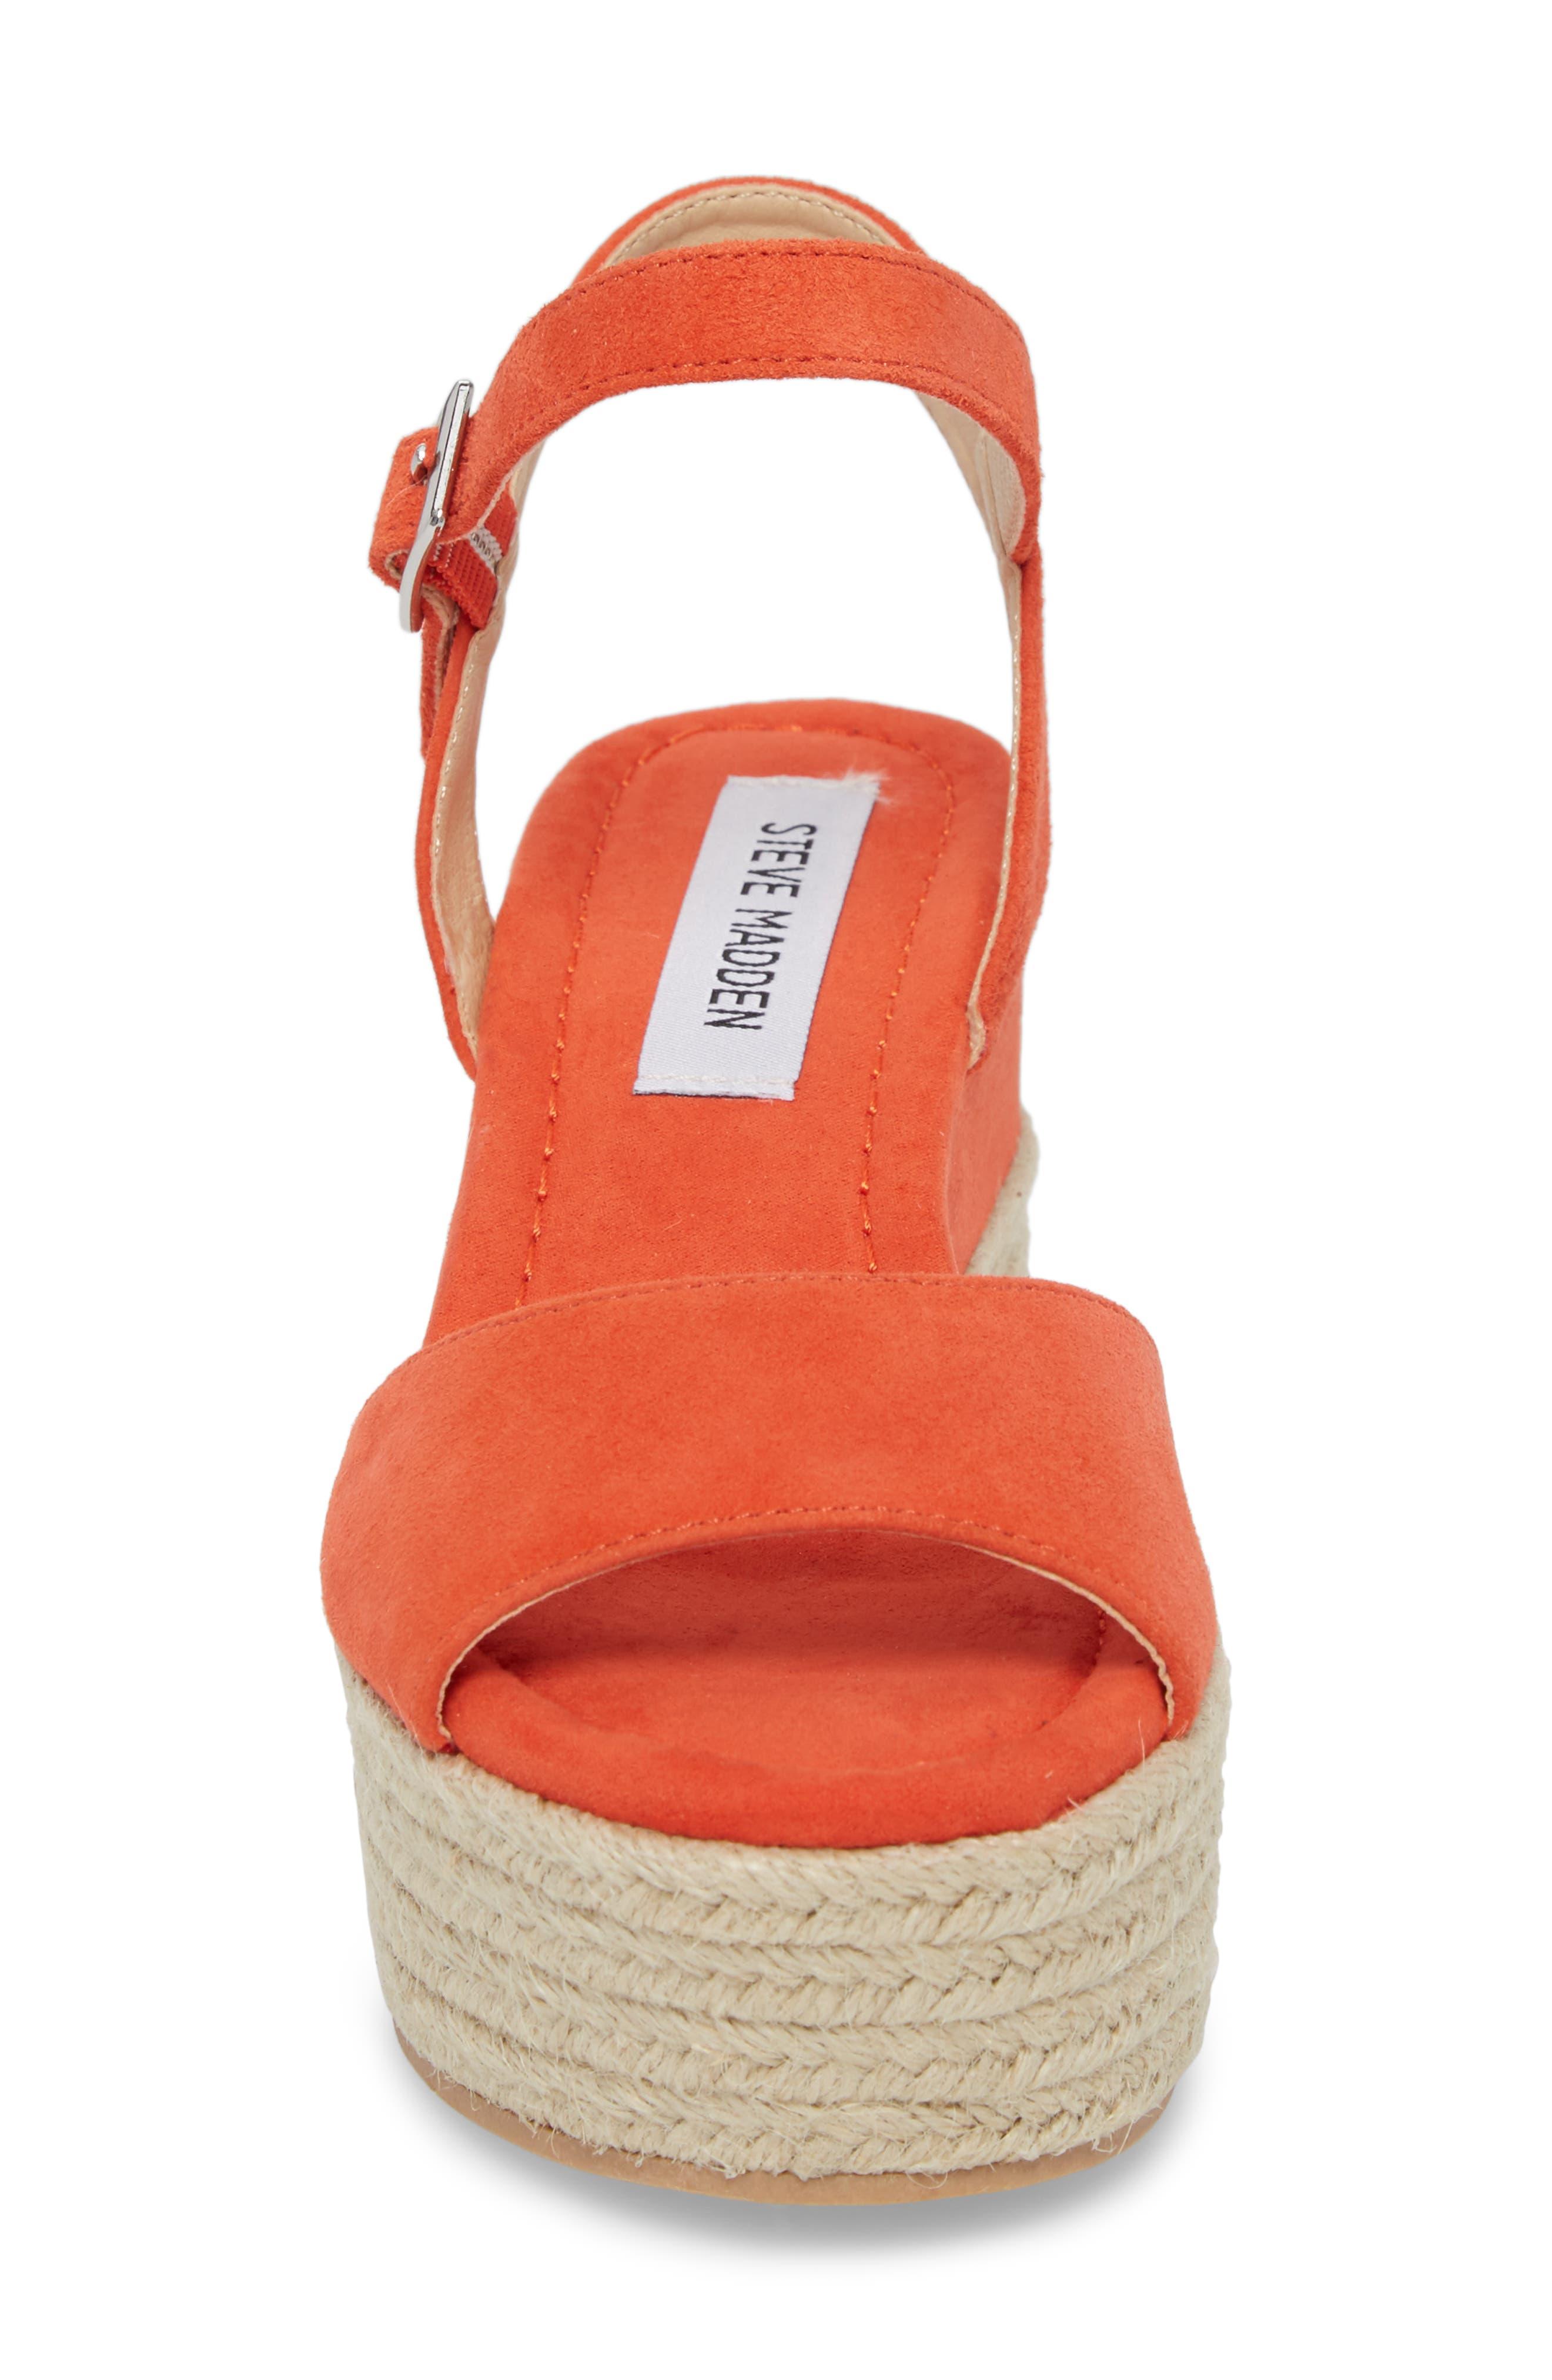 Kianna Espadrille Wedge Sandal,                             Alternate thumbnail 4, color,                             Coral Suede